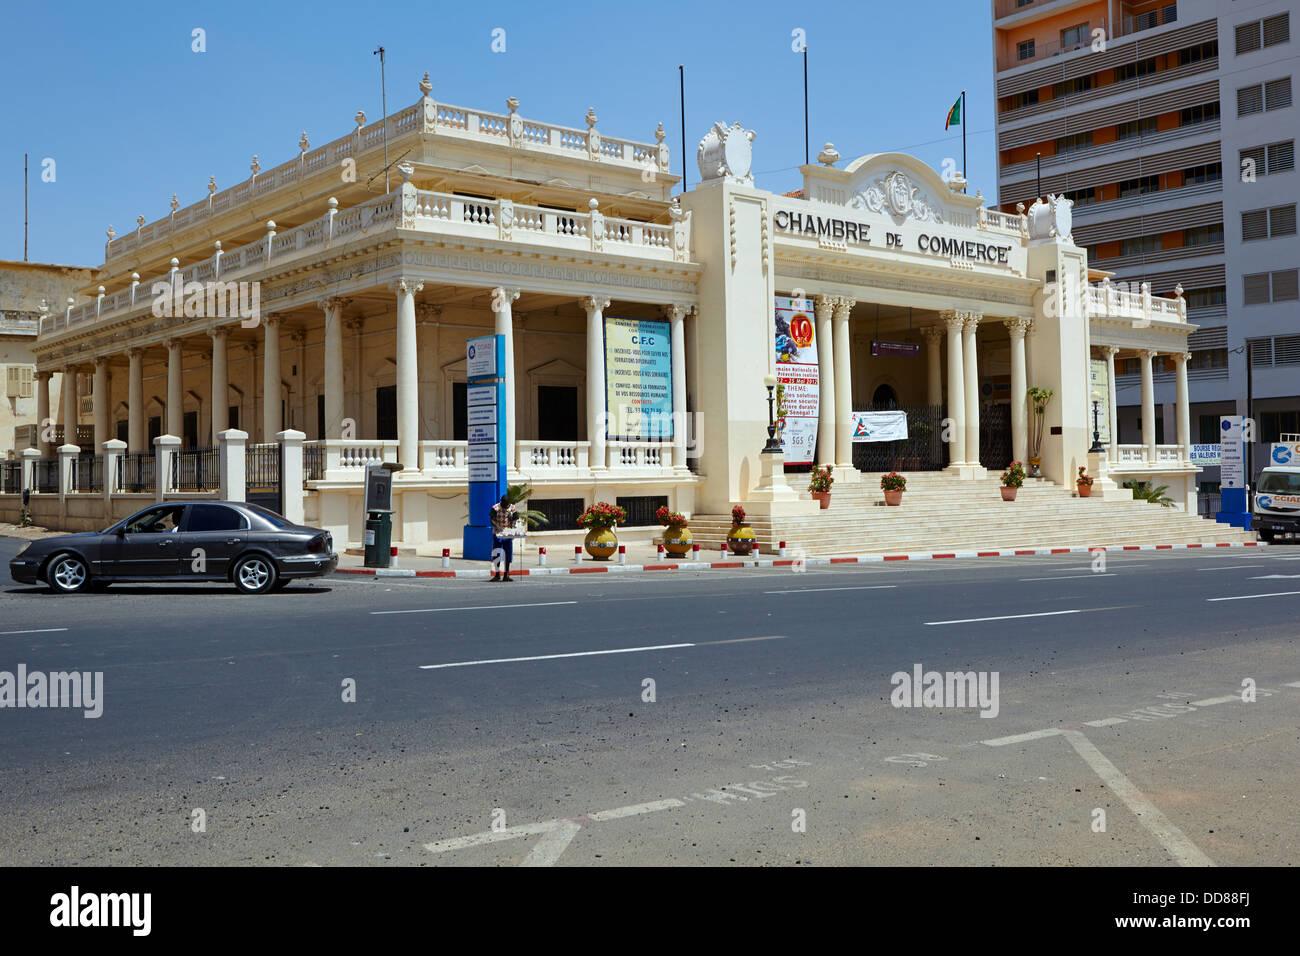 Chambre de Commerce, Dakar, Senegal, Africa - Stock Image